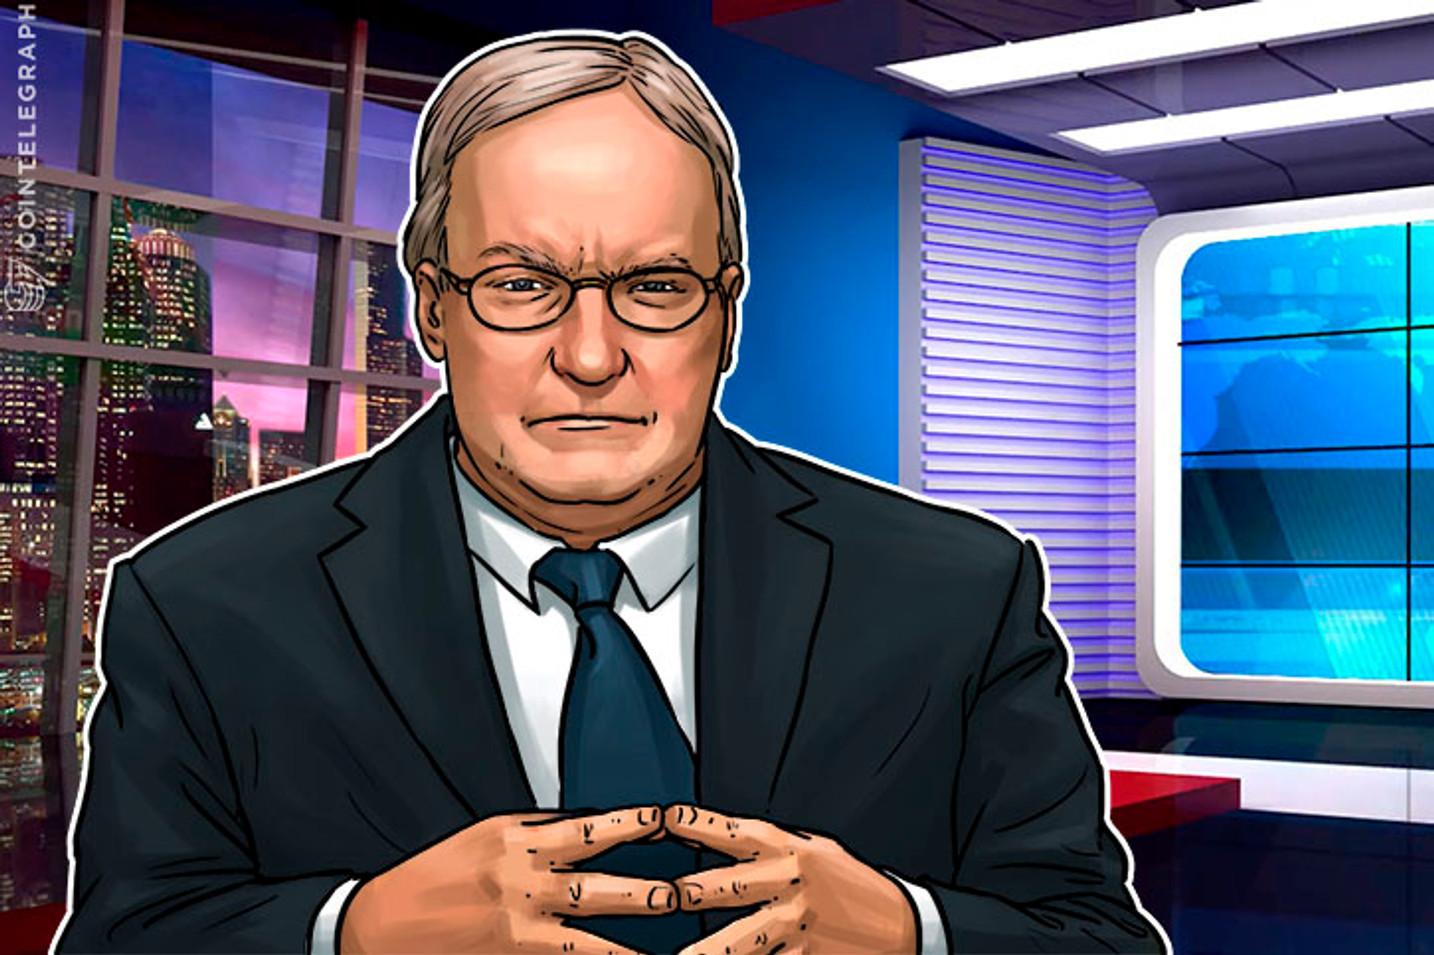 Otro inversor tradicional evita a Bitcoin en confusión